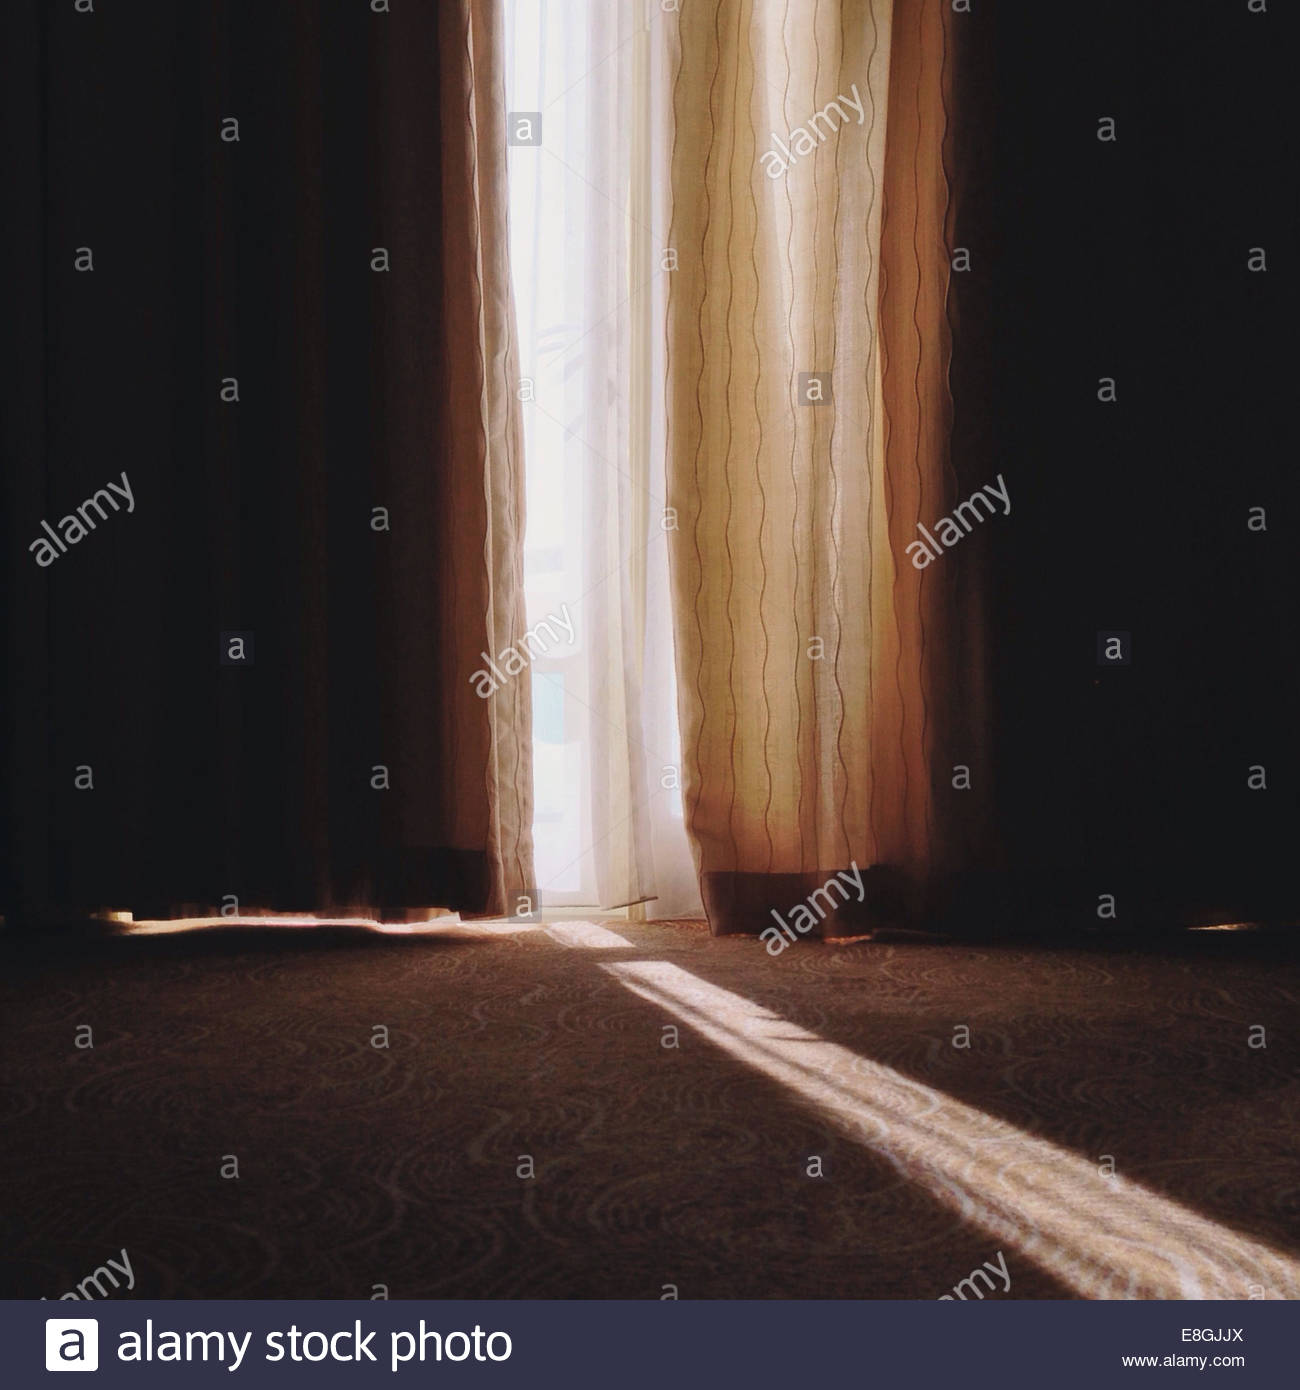 Sunbeam durchschimmern Lücke in Gardinen Stockbild